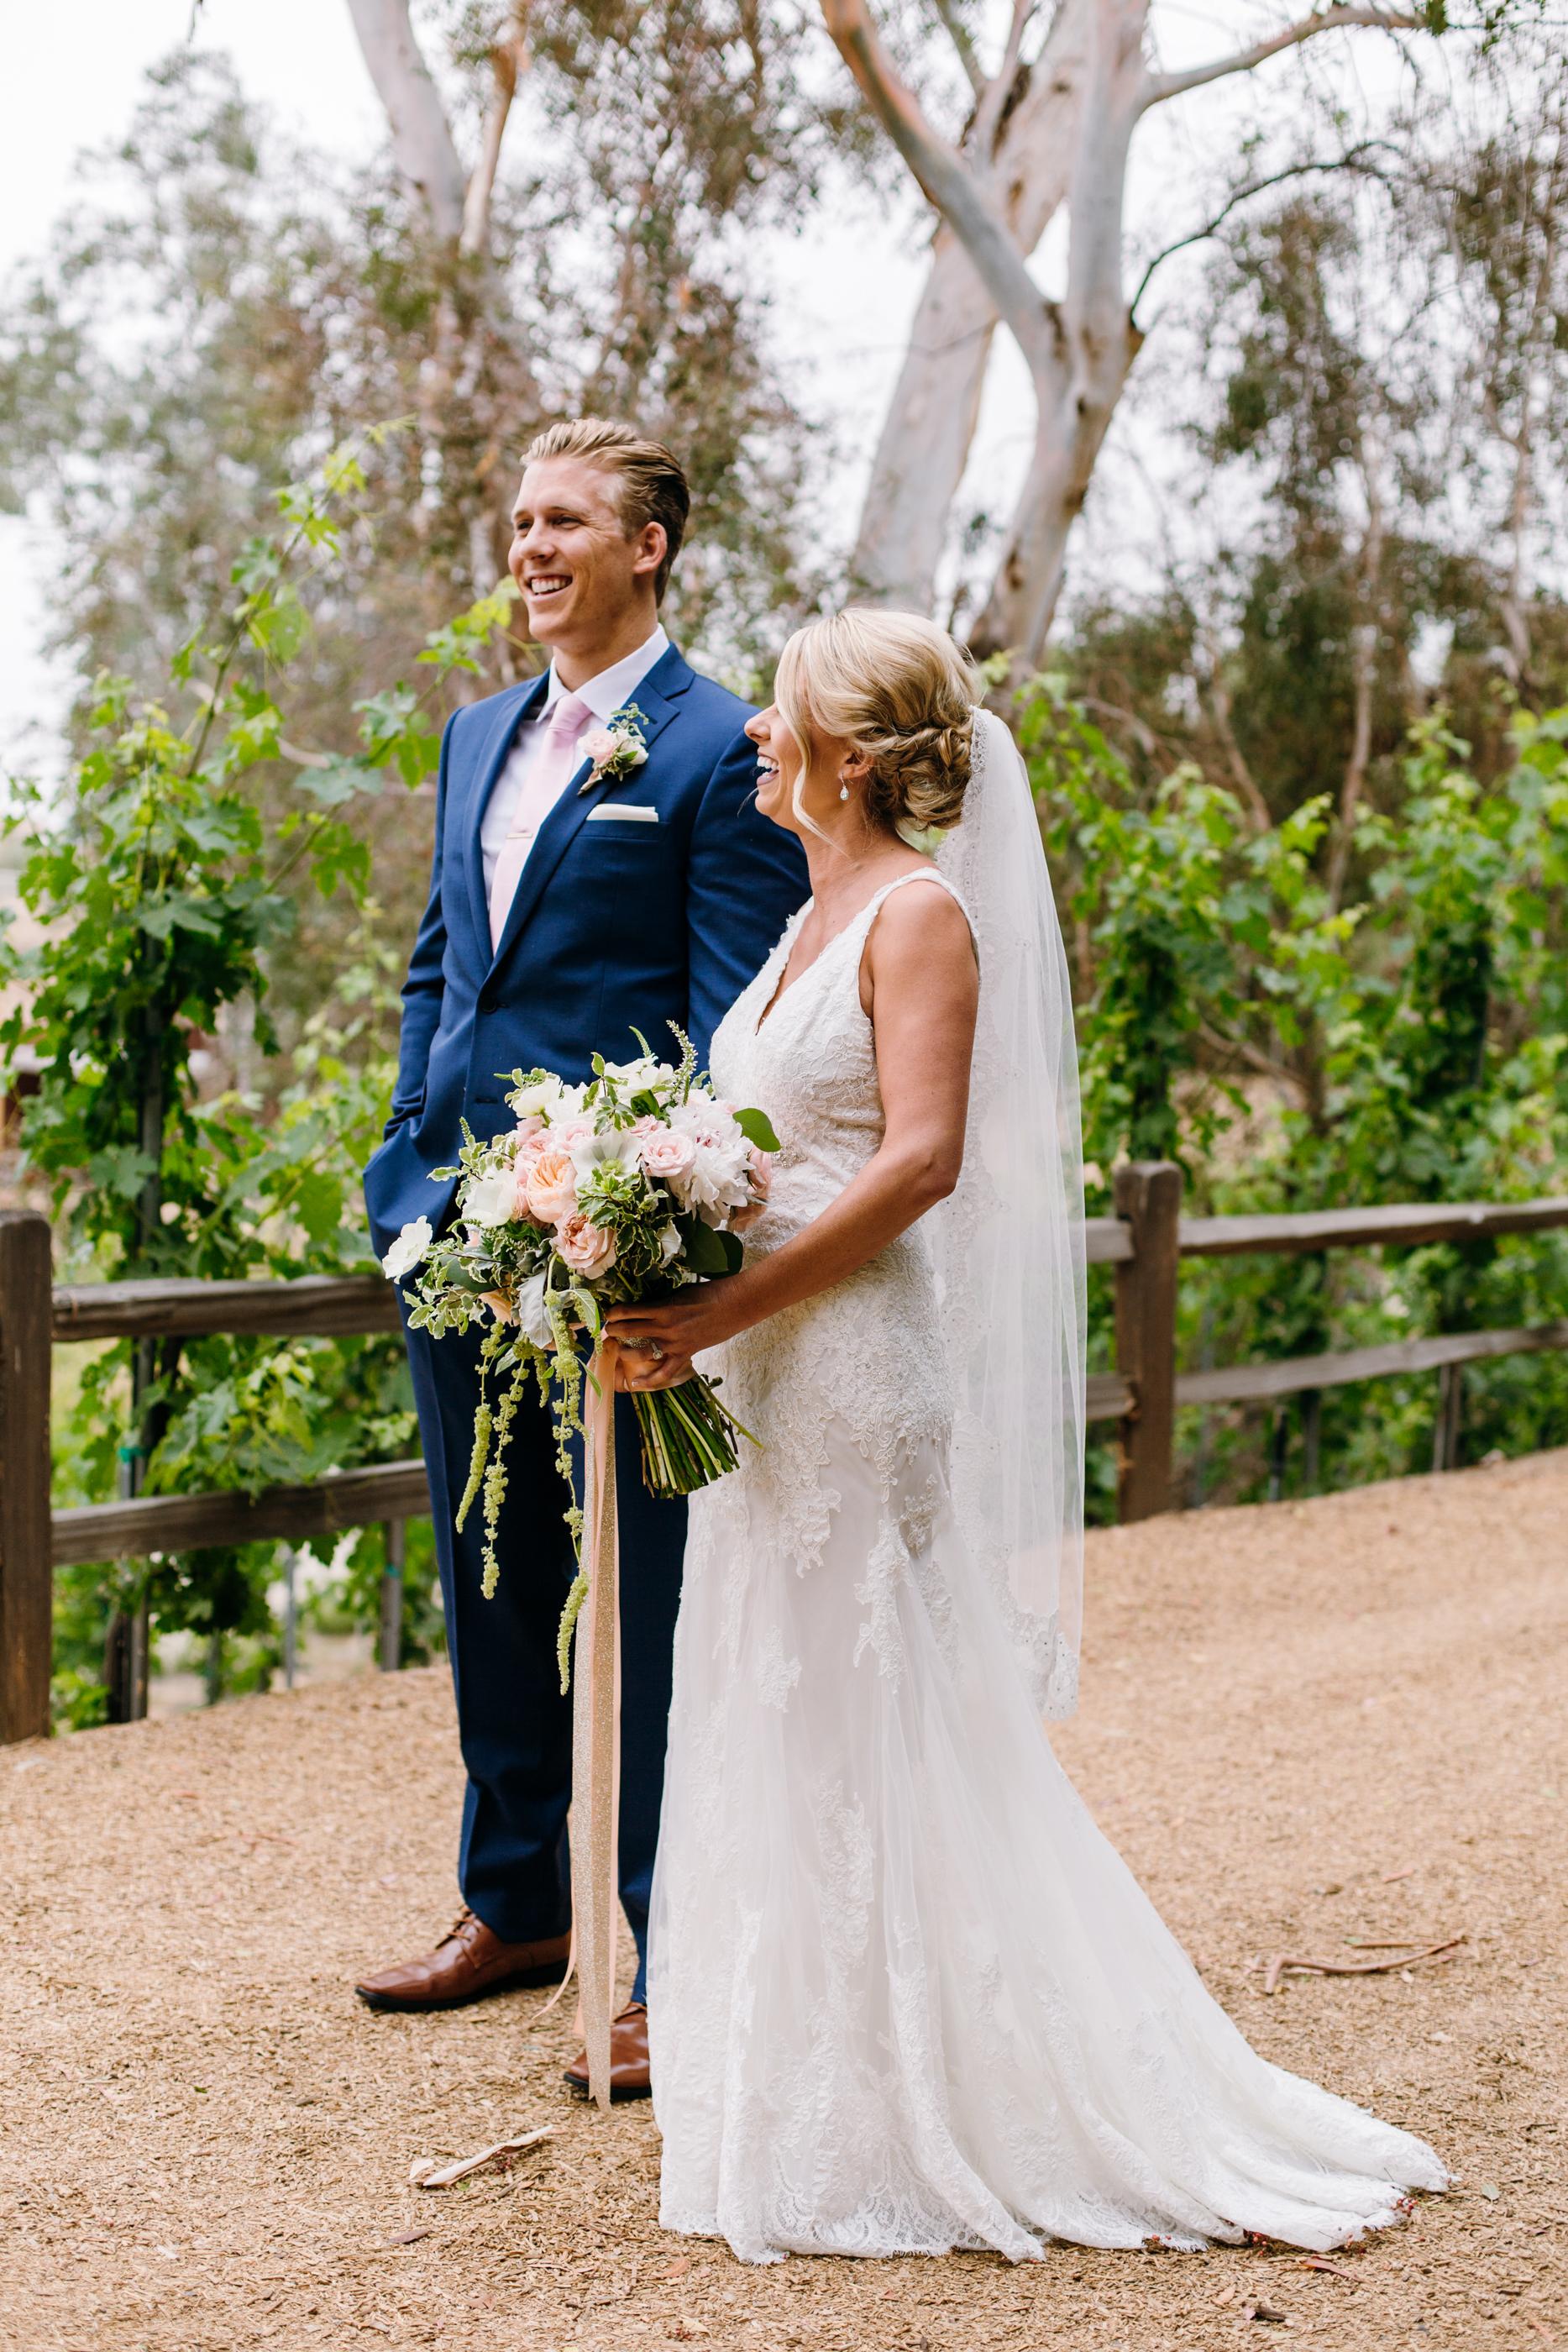 KaraNixonWeddings-LakeOakMeadows-Temecula-Wedding-18.jpg